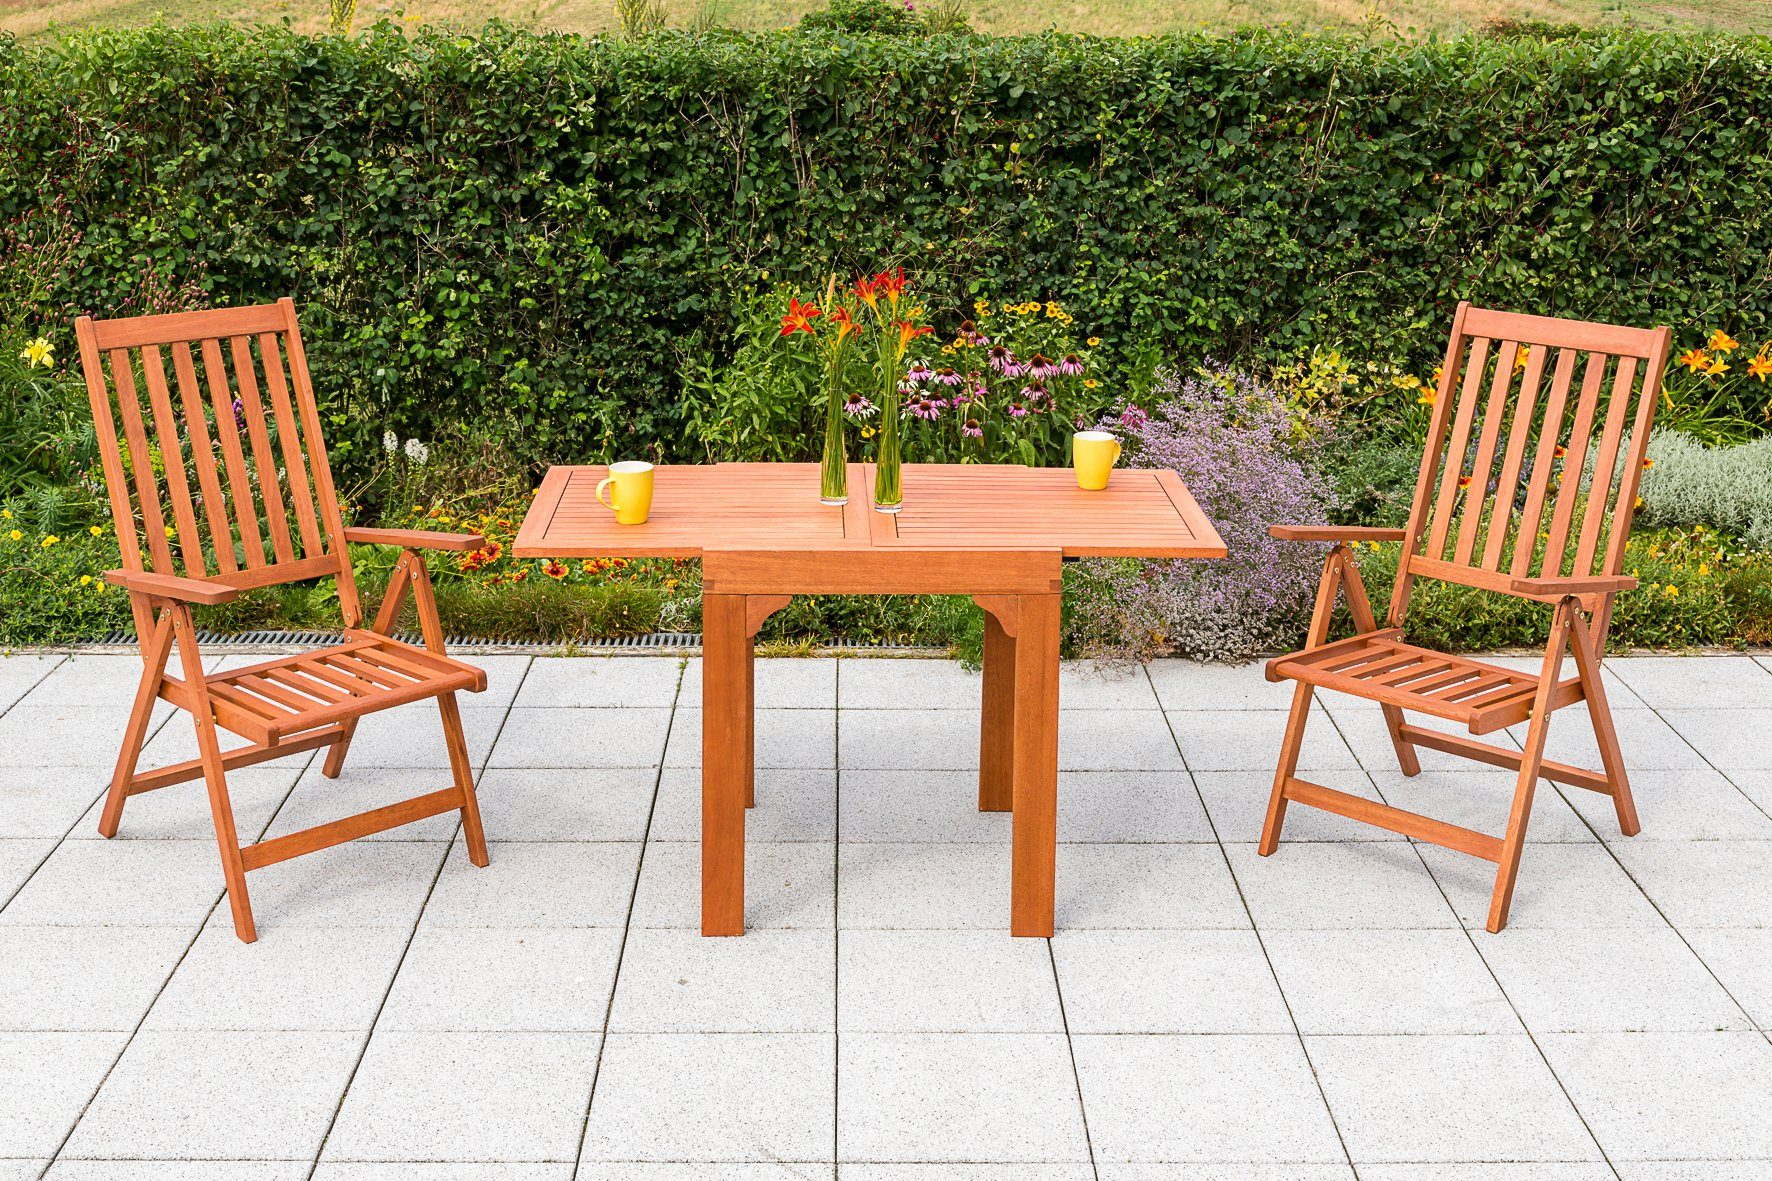 MERXX Gartenmöbelset »Vitoria«, 3tlg., 2 Sessel, Tisch, klappbar, ausziehbar, Eukalyptus